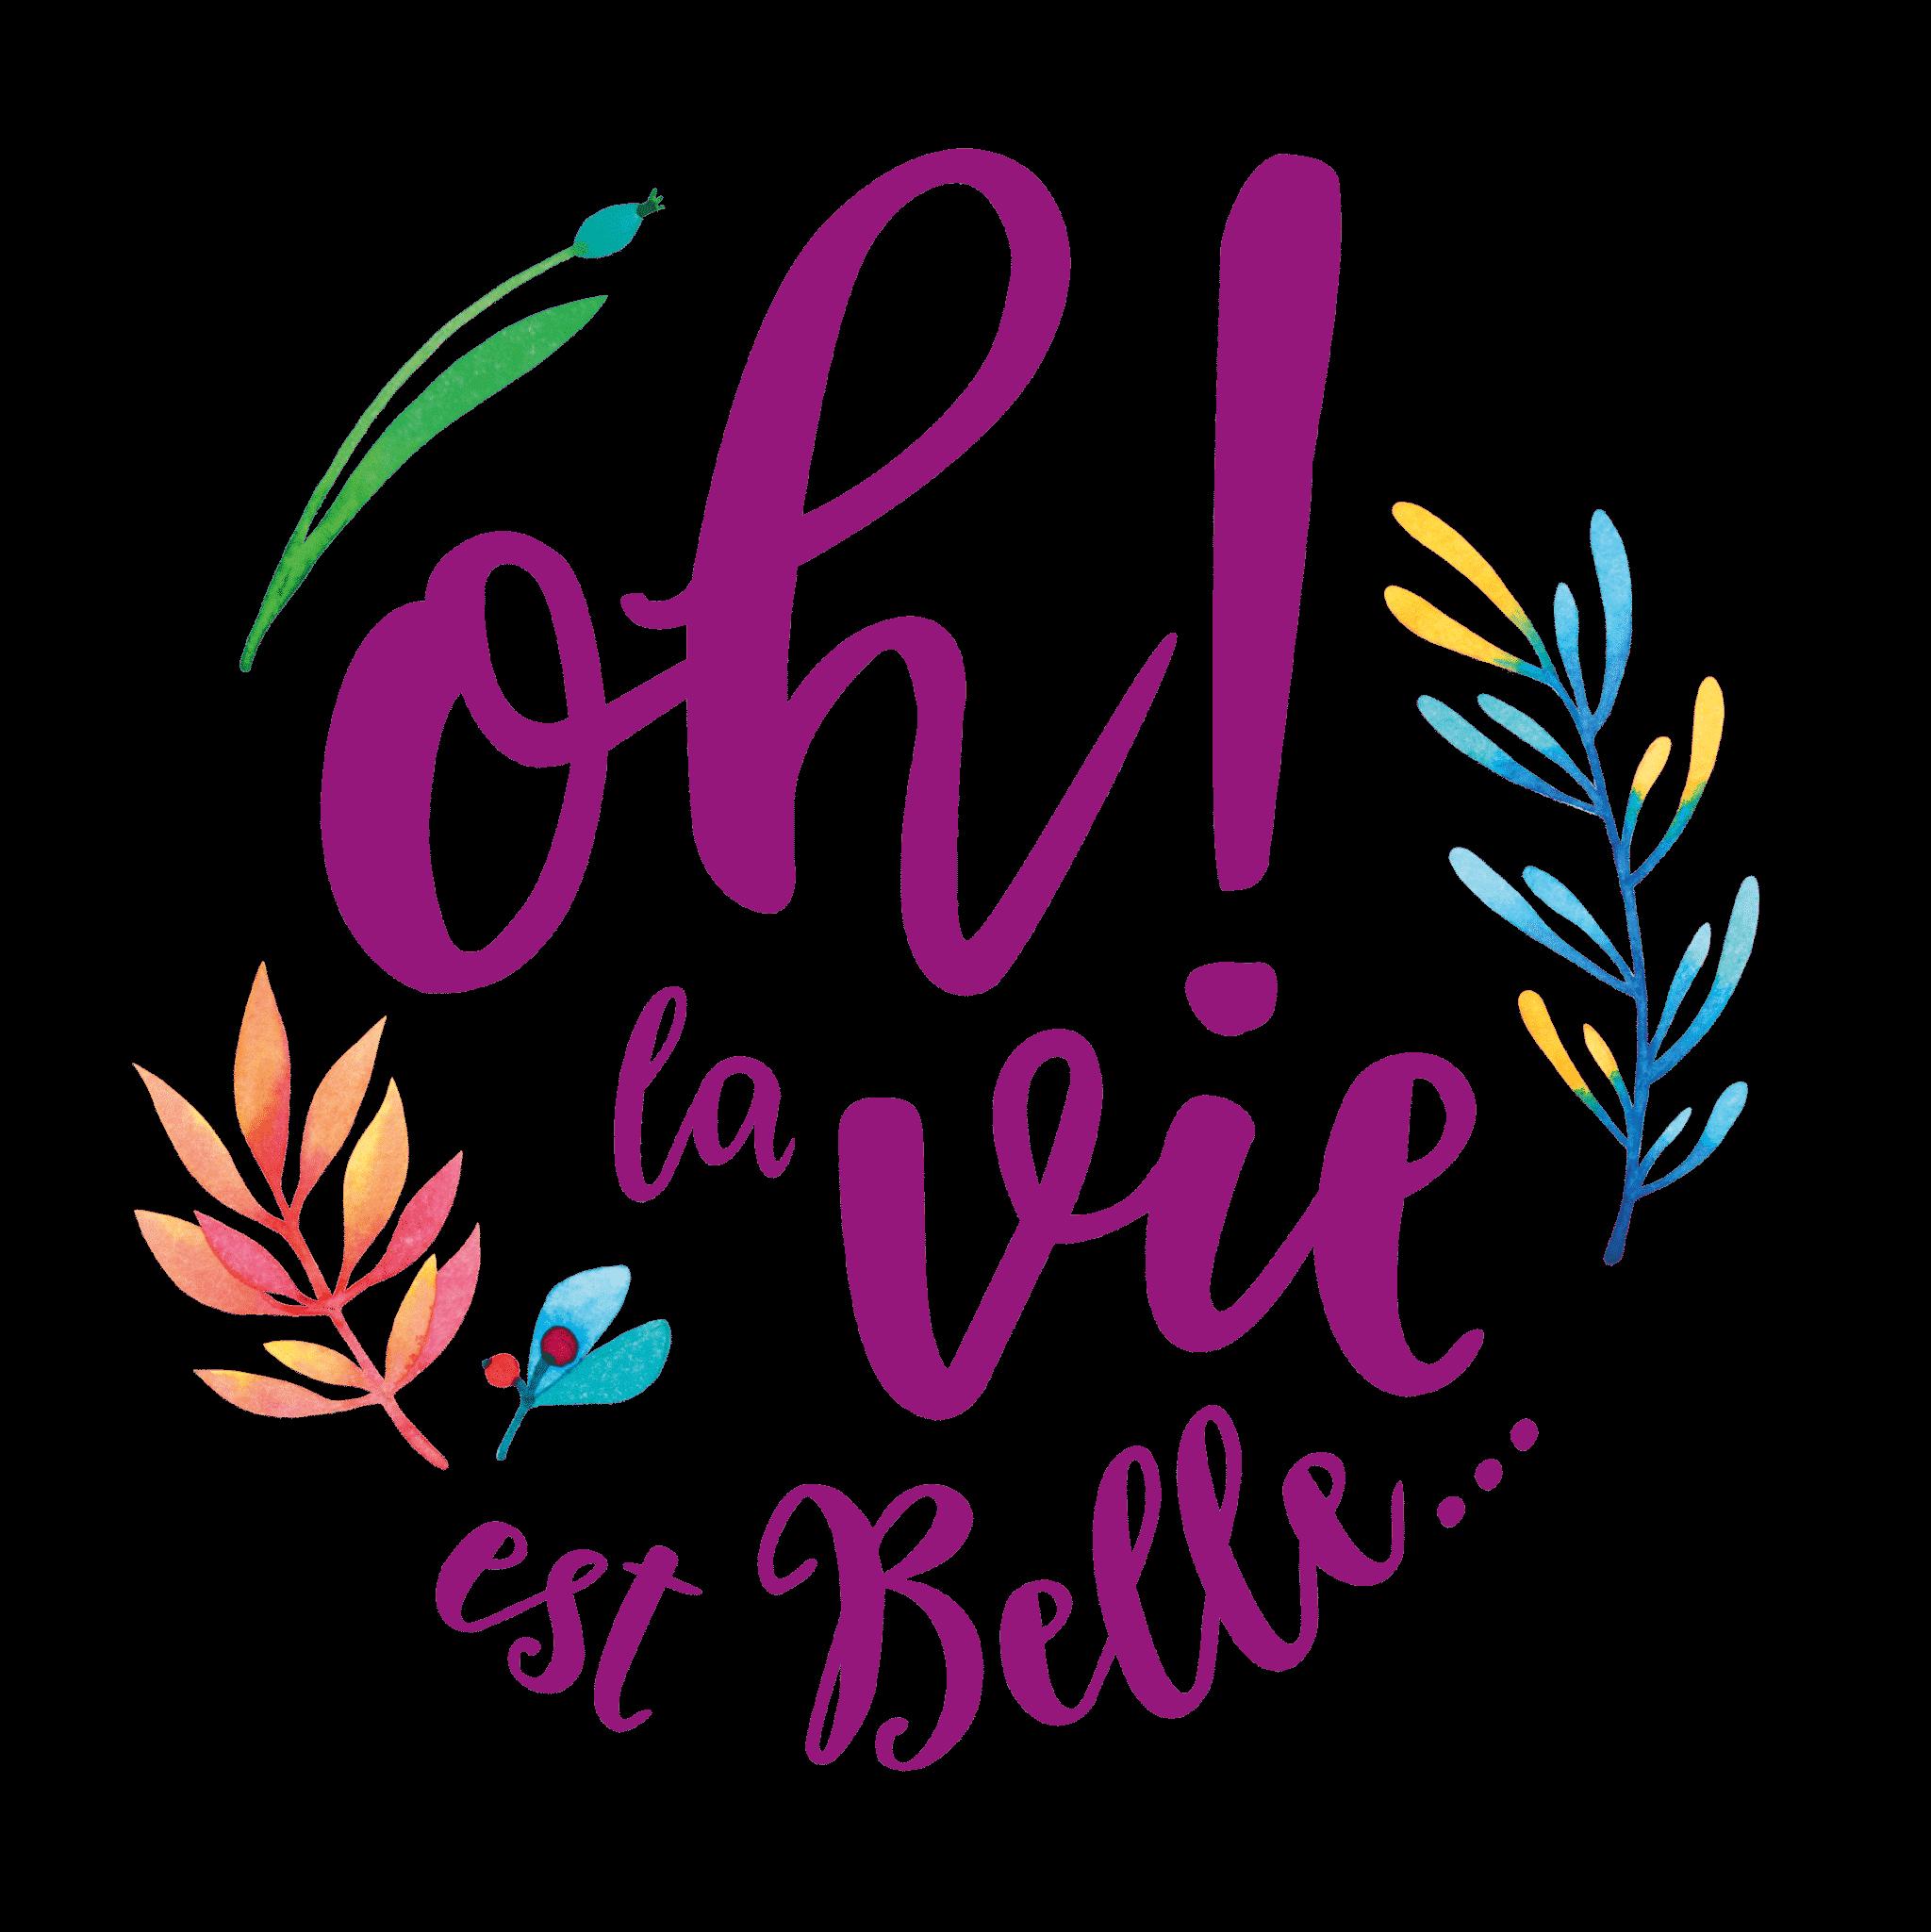 Logotype Ohlavieestbelle